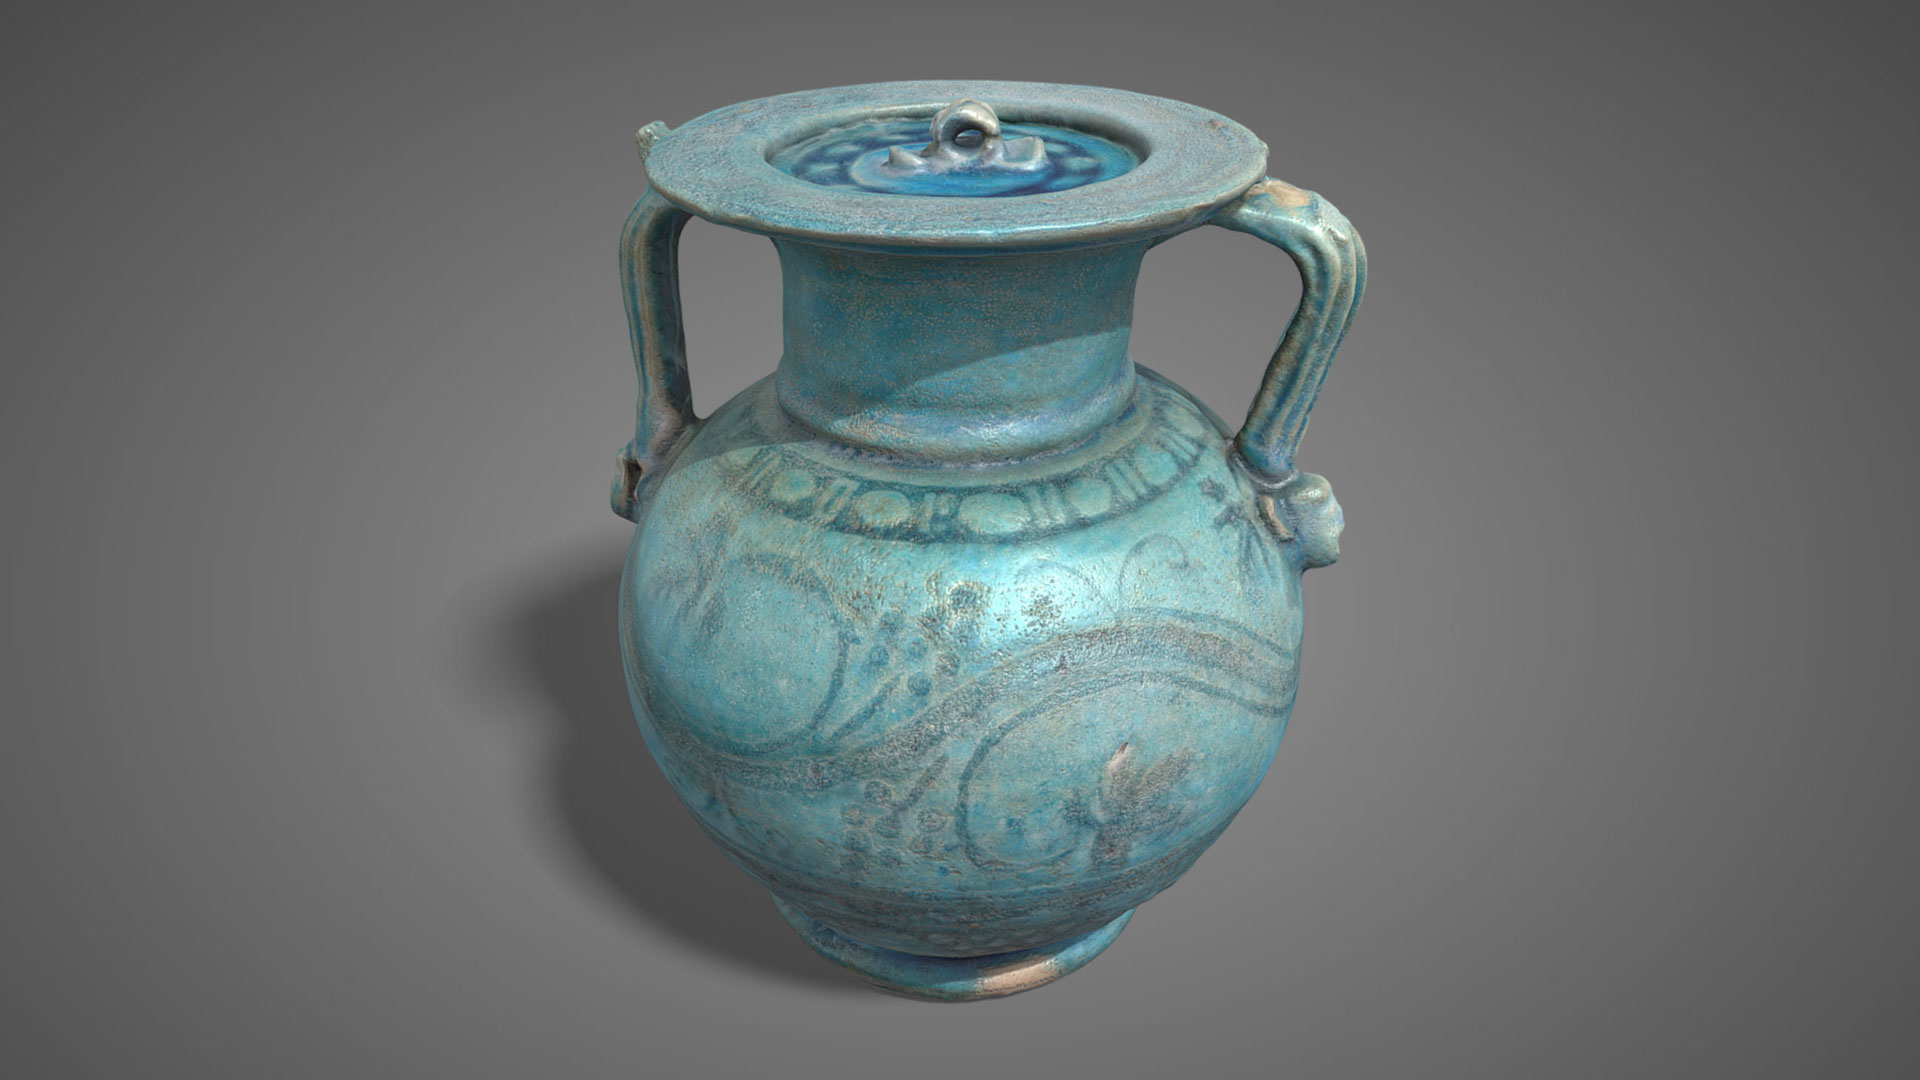 Anforetta in vetro | Glass Amphora - 3D Model